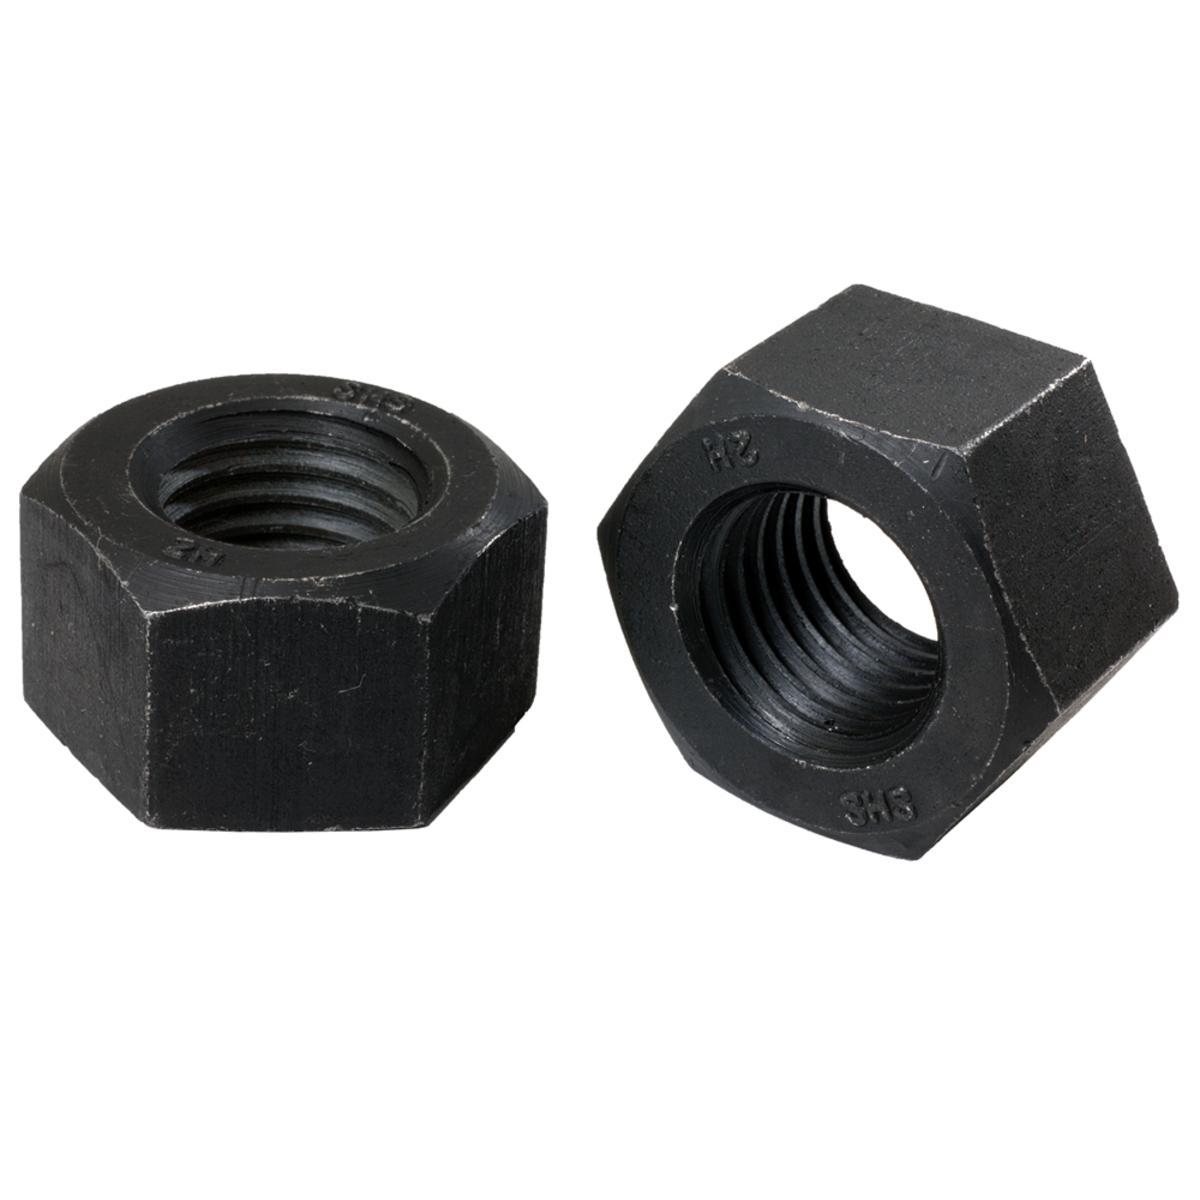 "1""-8 Heavy Hex Nuts — ASTM A194 Grade 2H, Plain - Coarse, 10/PKG"